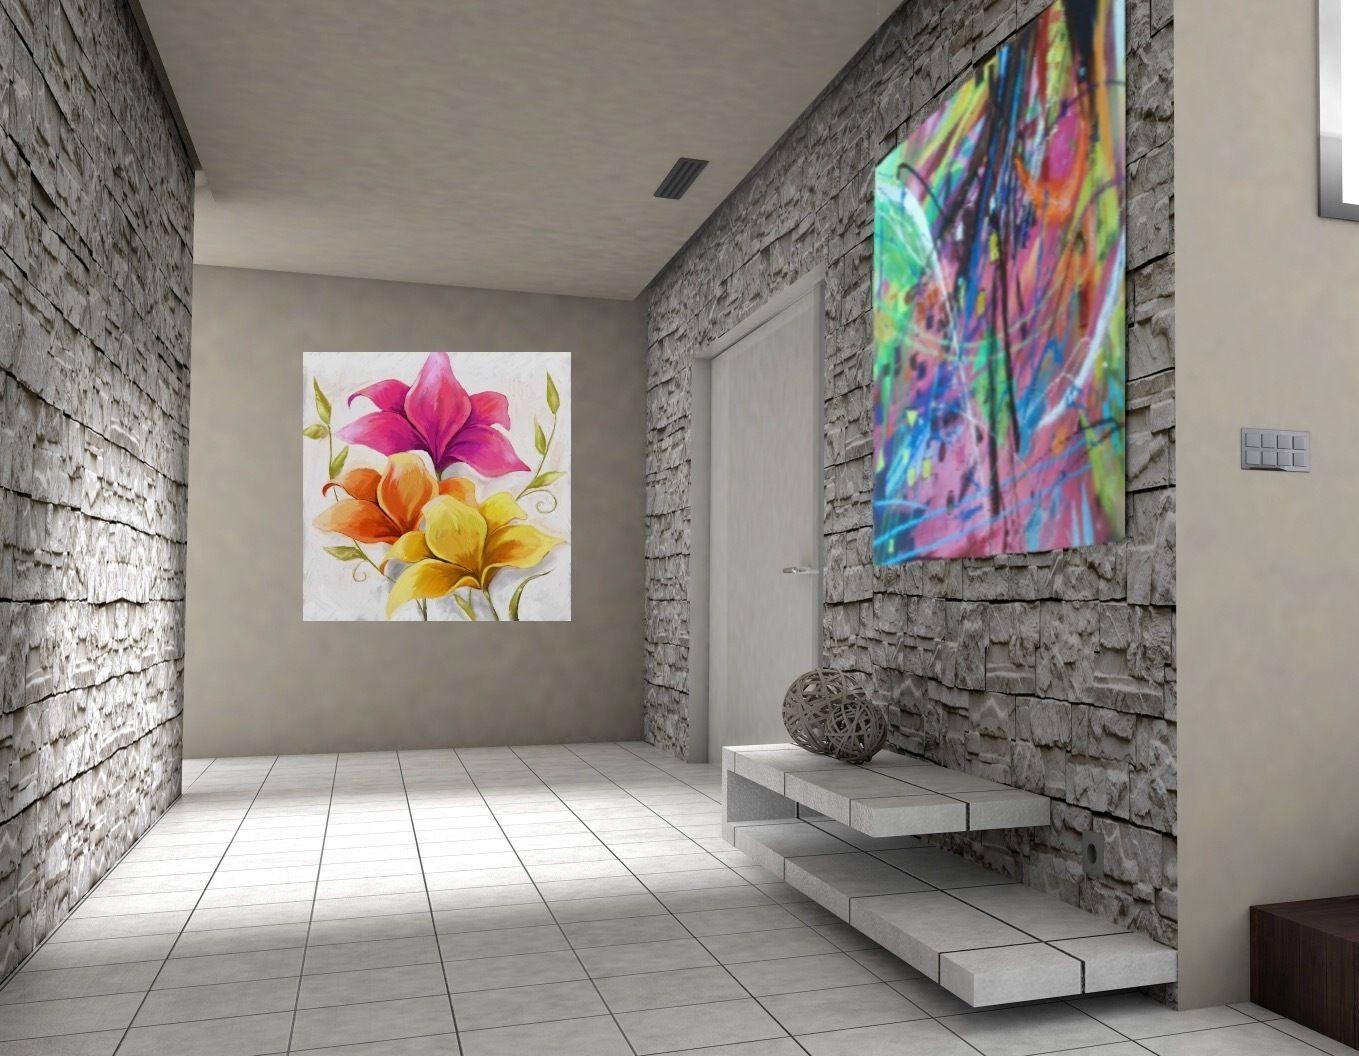 1359 1056 cuadros modernos cuadros de On cuadros modernos para pasillos